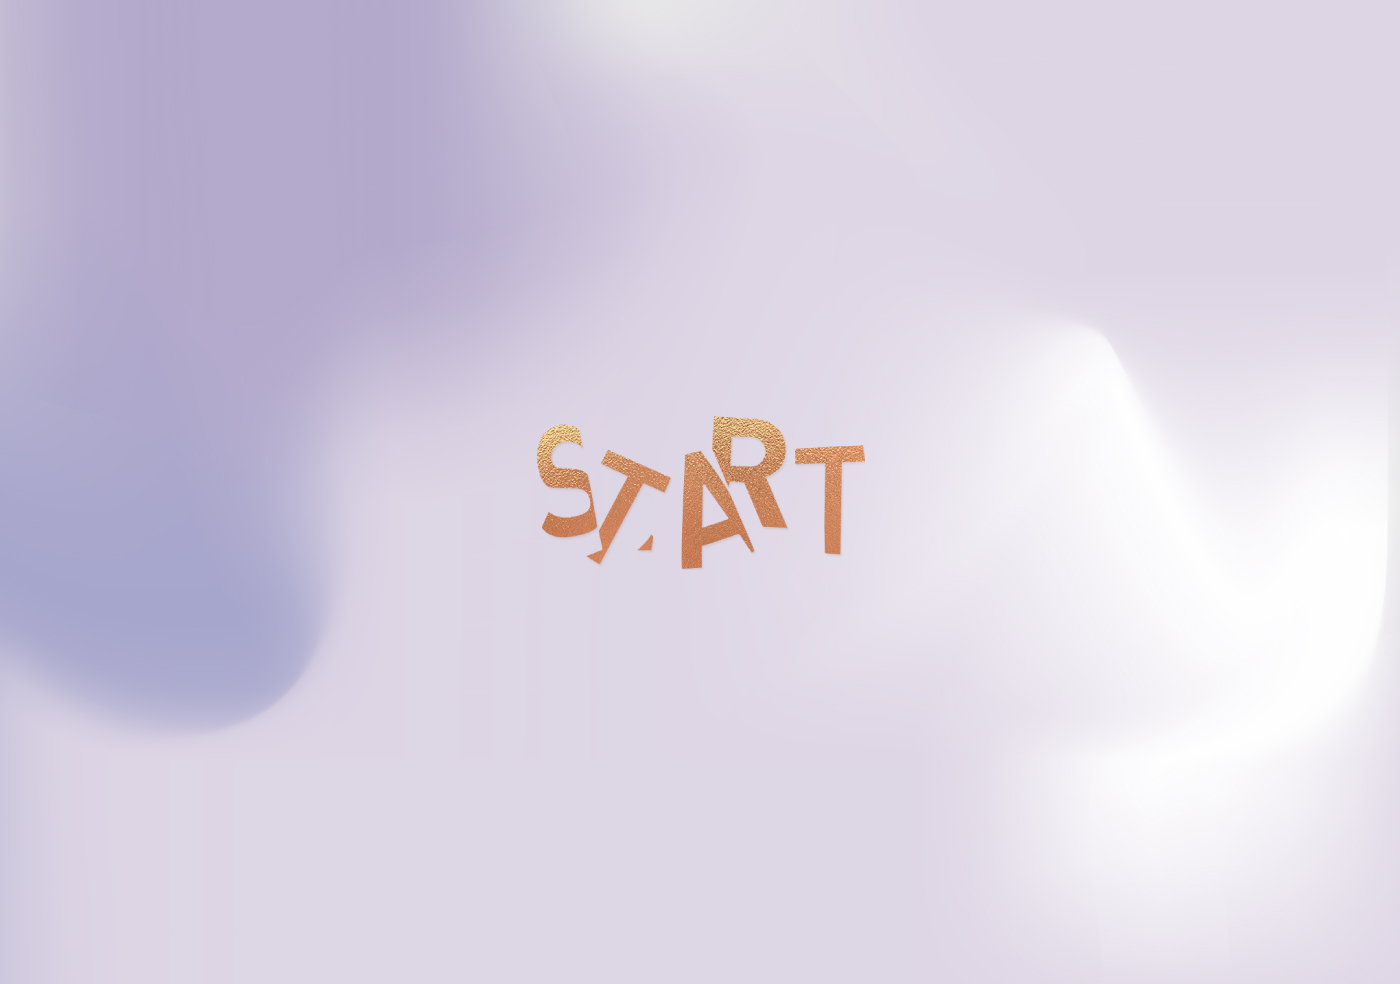 St-art